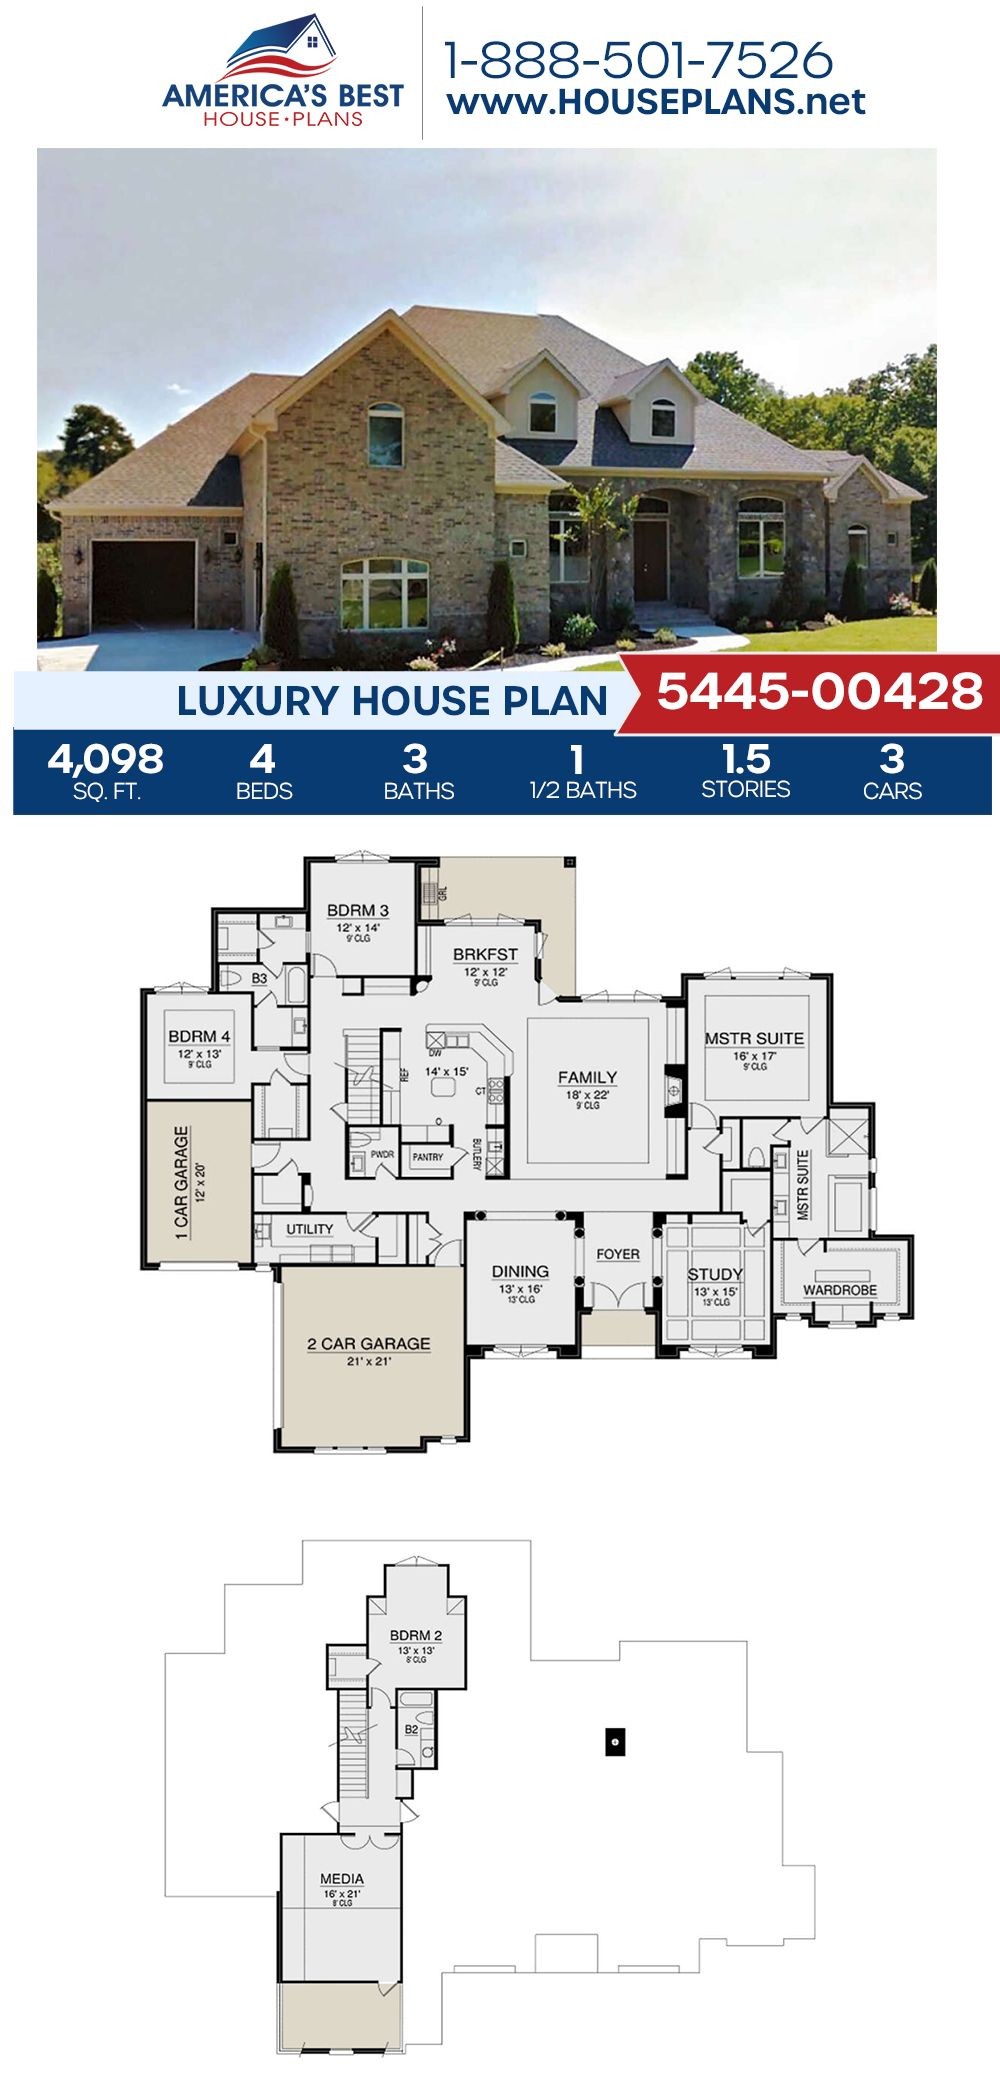 House Plan 5445 00428 Traditional Plan 4 098 Square Feet 4 Bedrooms 3 5 Bathrooms In 2020 House Plans Luxury House Plans House Blueprints